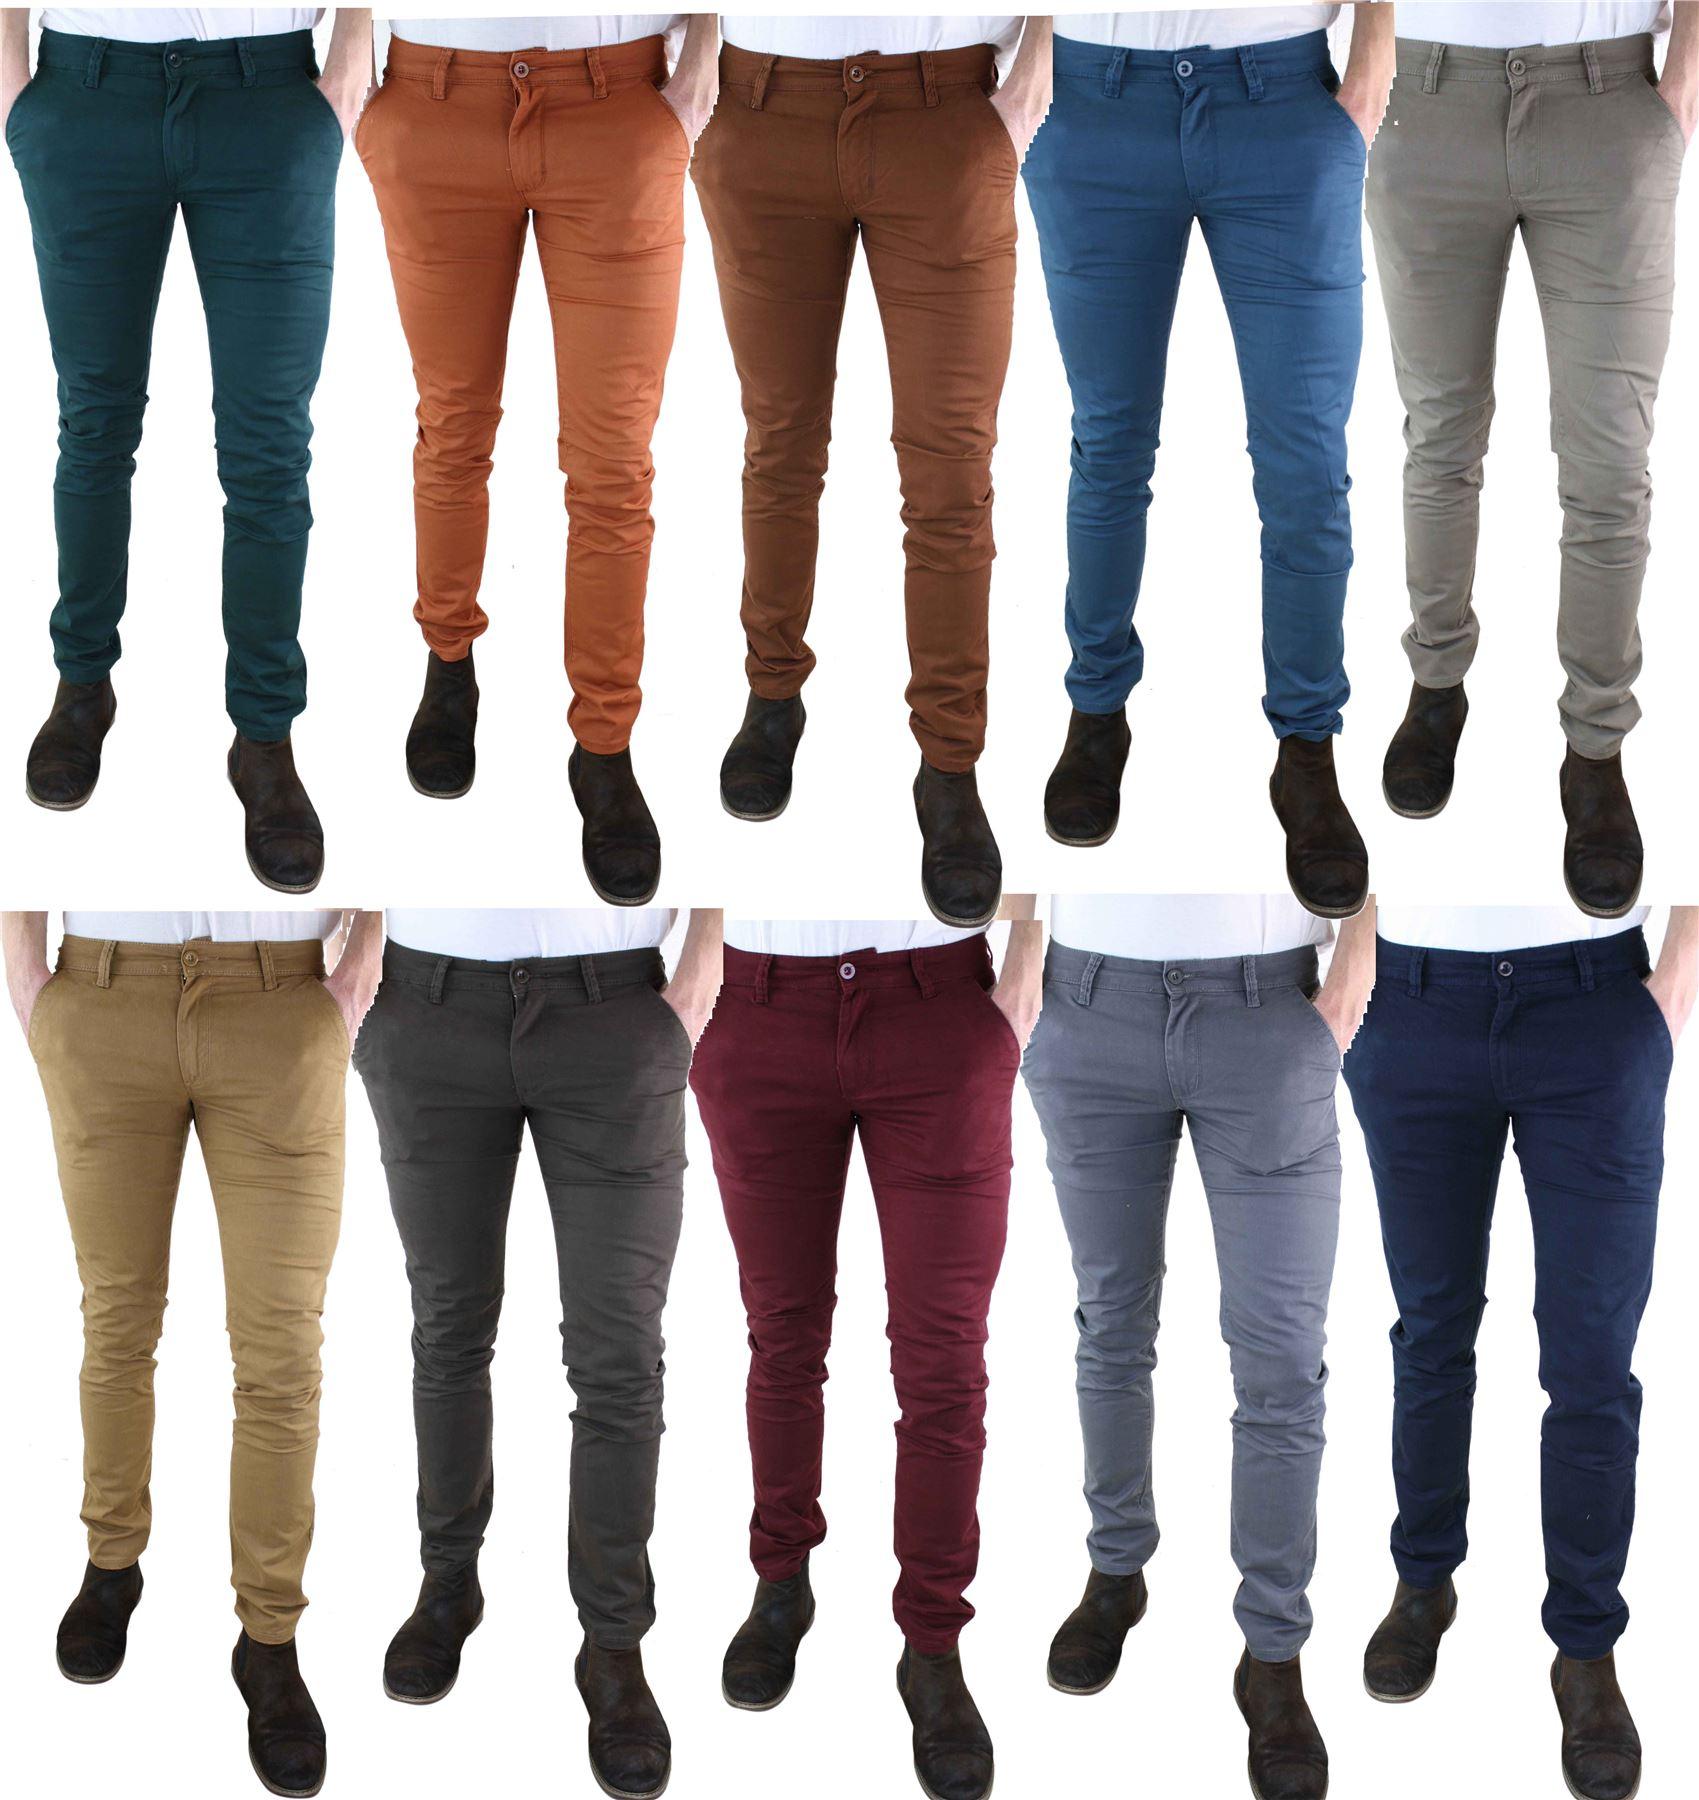 baa35358b755e Pantalon toile chino homme coton stretch coupe slim skinny ...